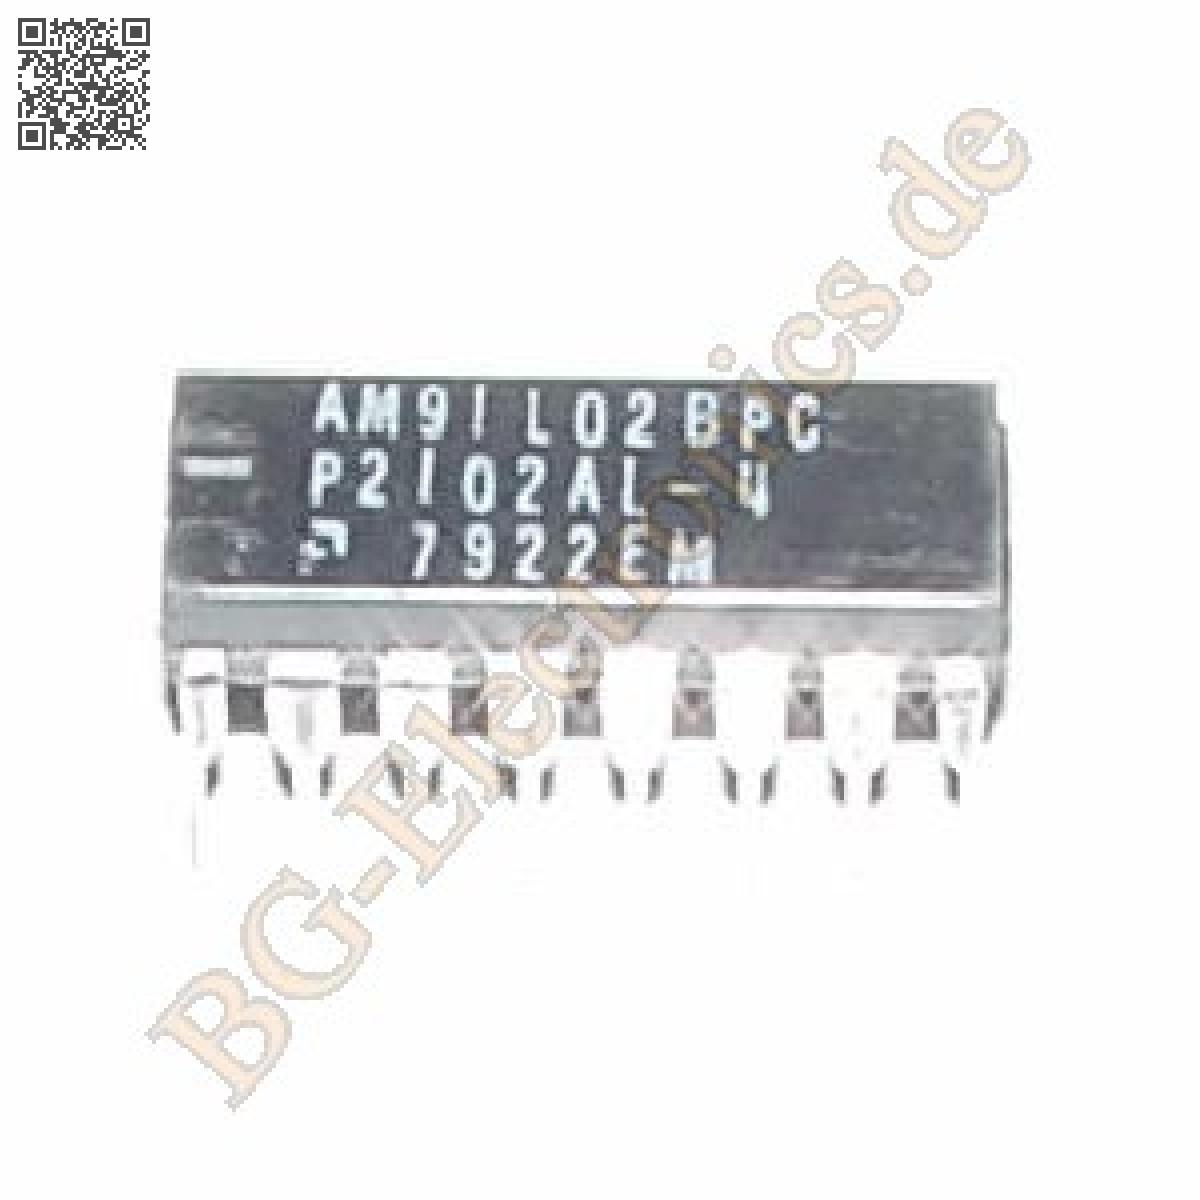 AM91L02BPC, BG-ELECTRONICS AM91L02BPC, AM91L02BP, AM91L02B, AM91L02